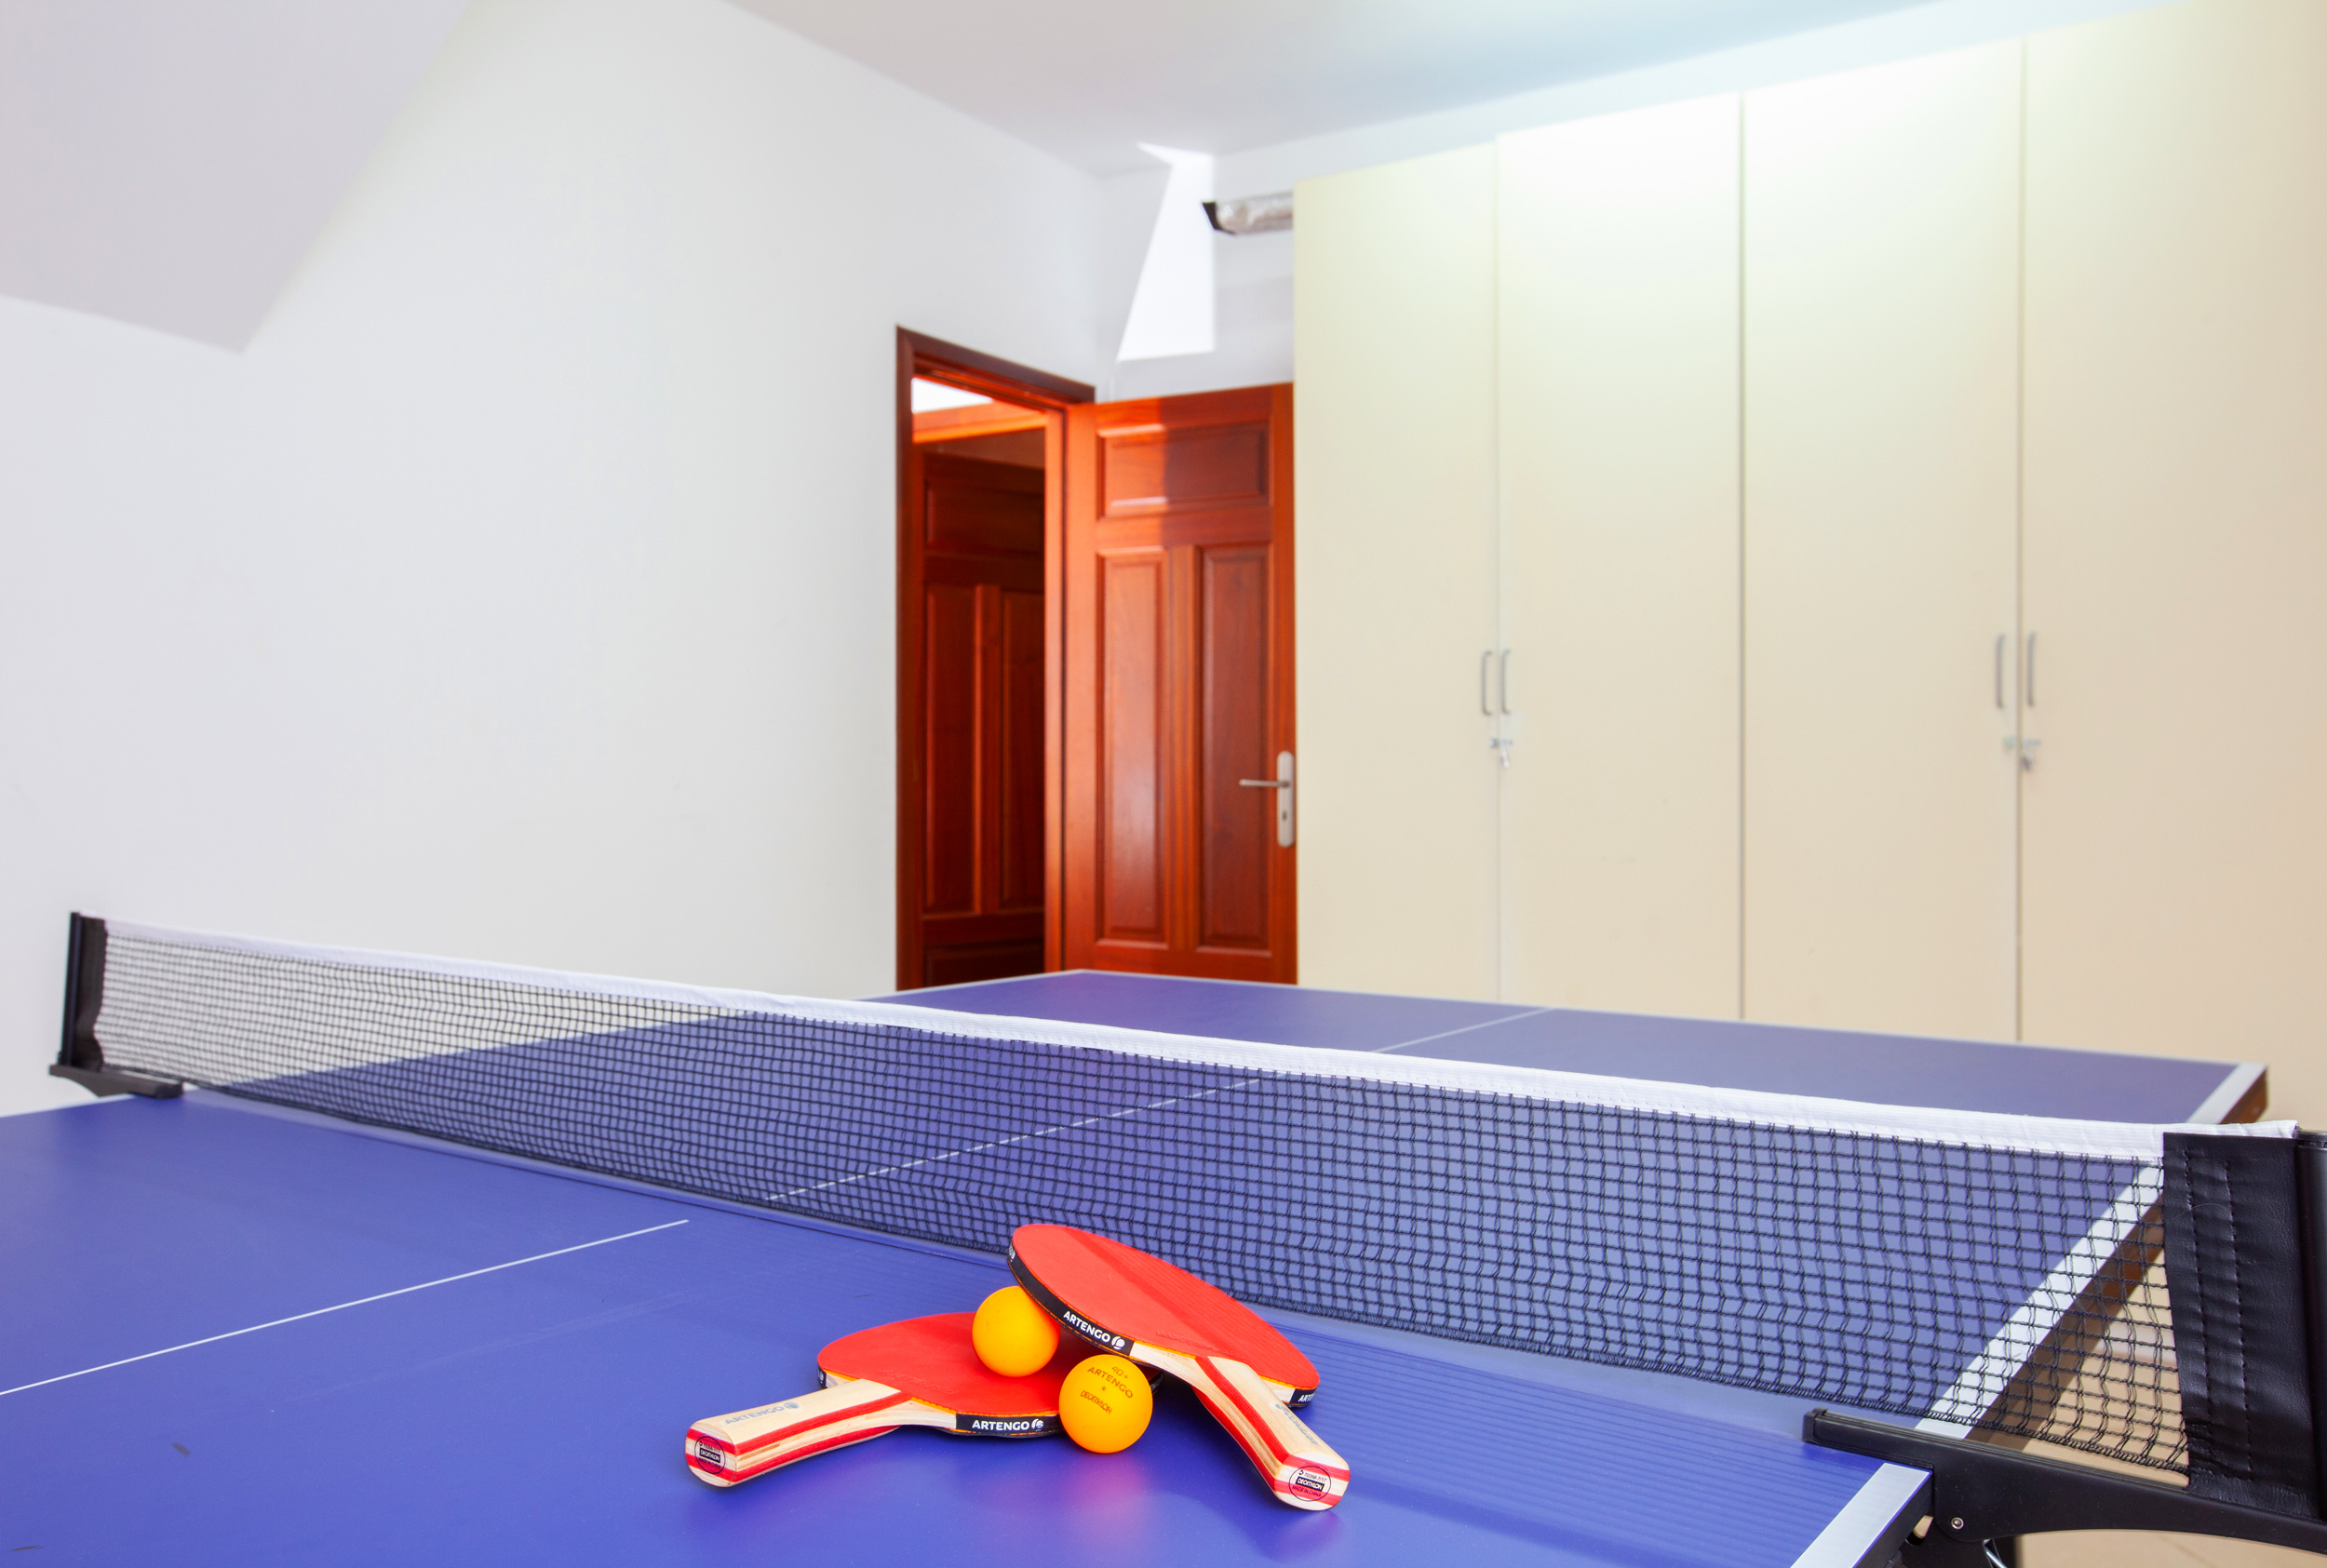 LVC311041 table tennis